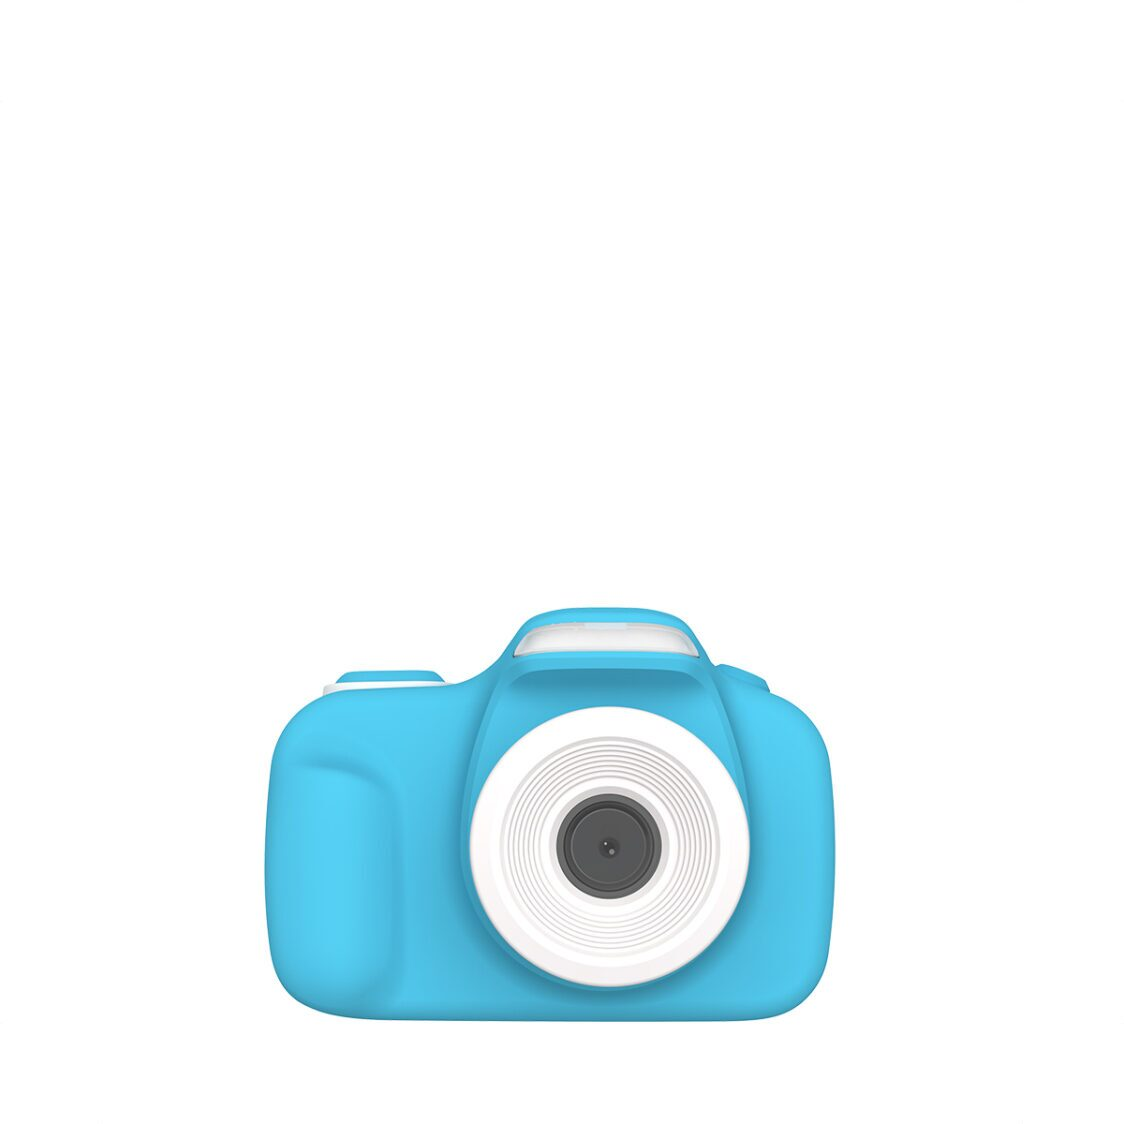 myFirst Camera 3 16MP Photo  Video Selfie  Macro Mode